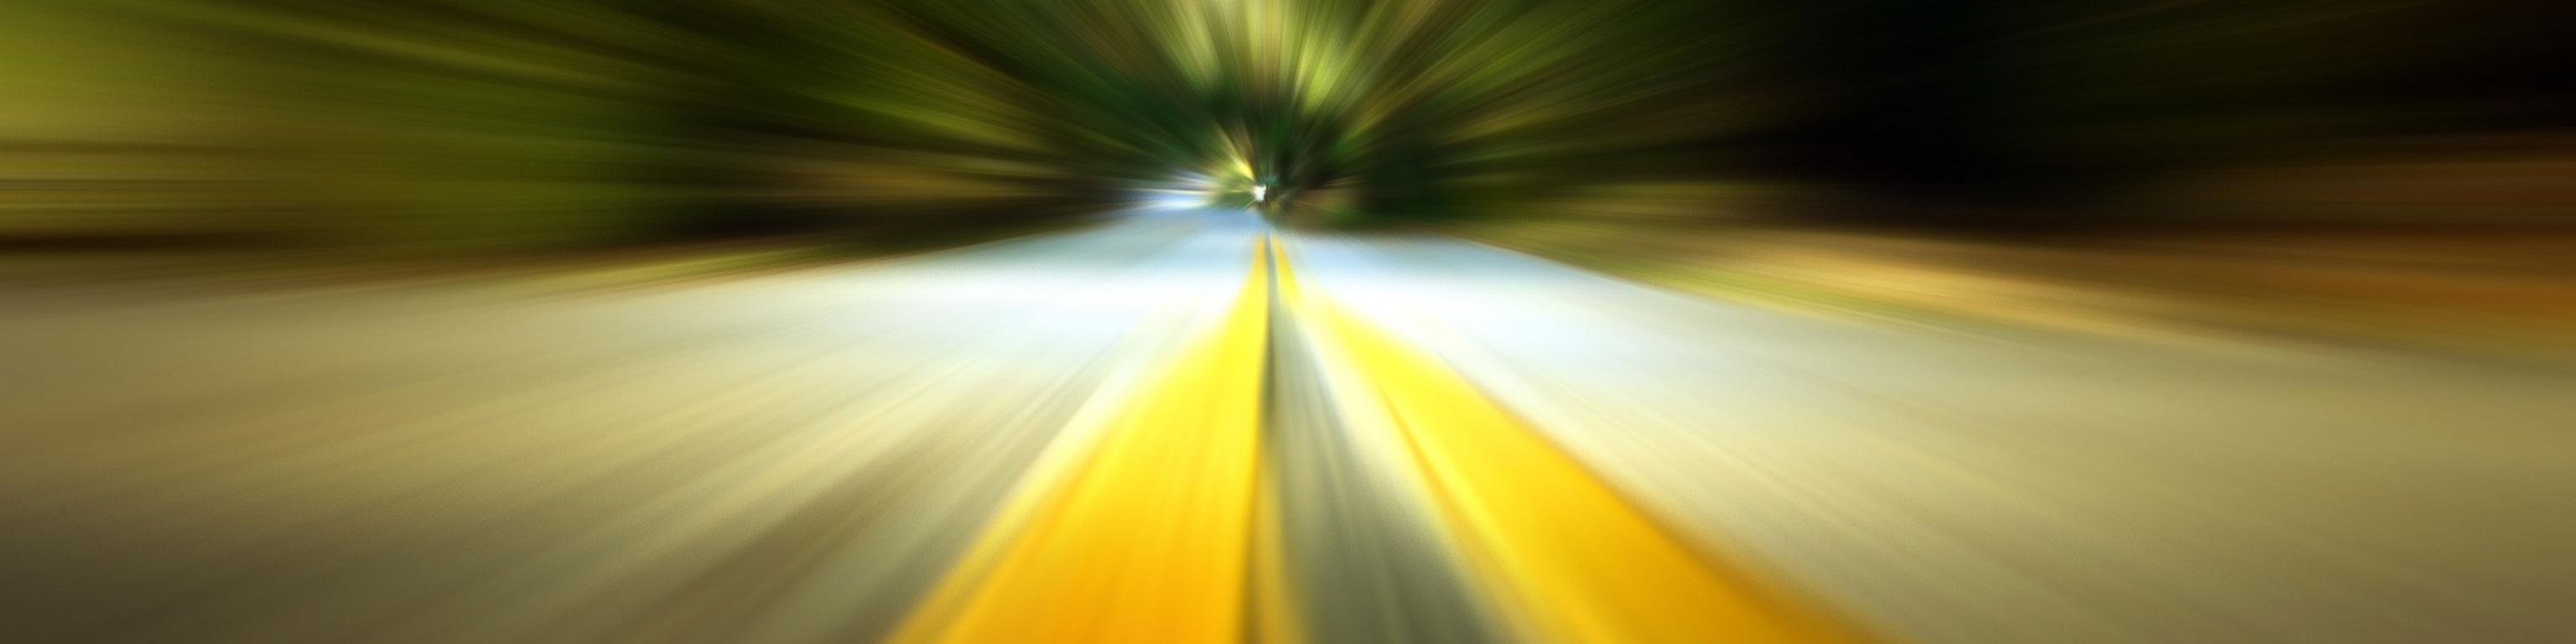 how to get speeding ticket reduced in alberta